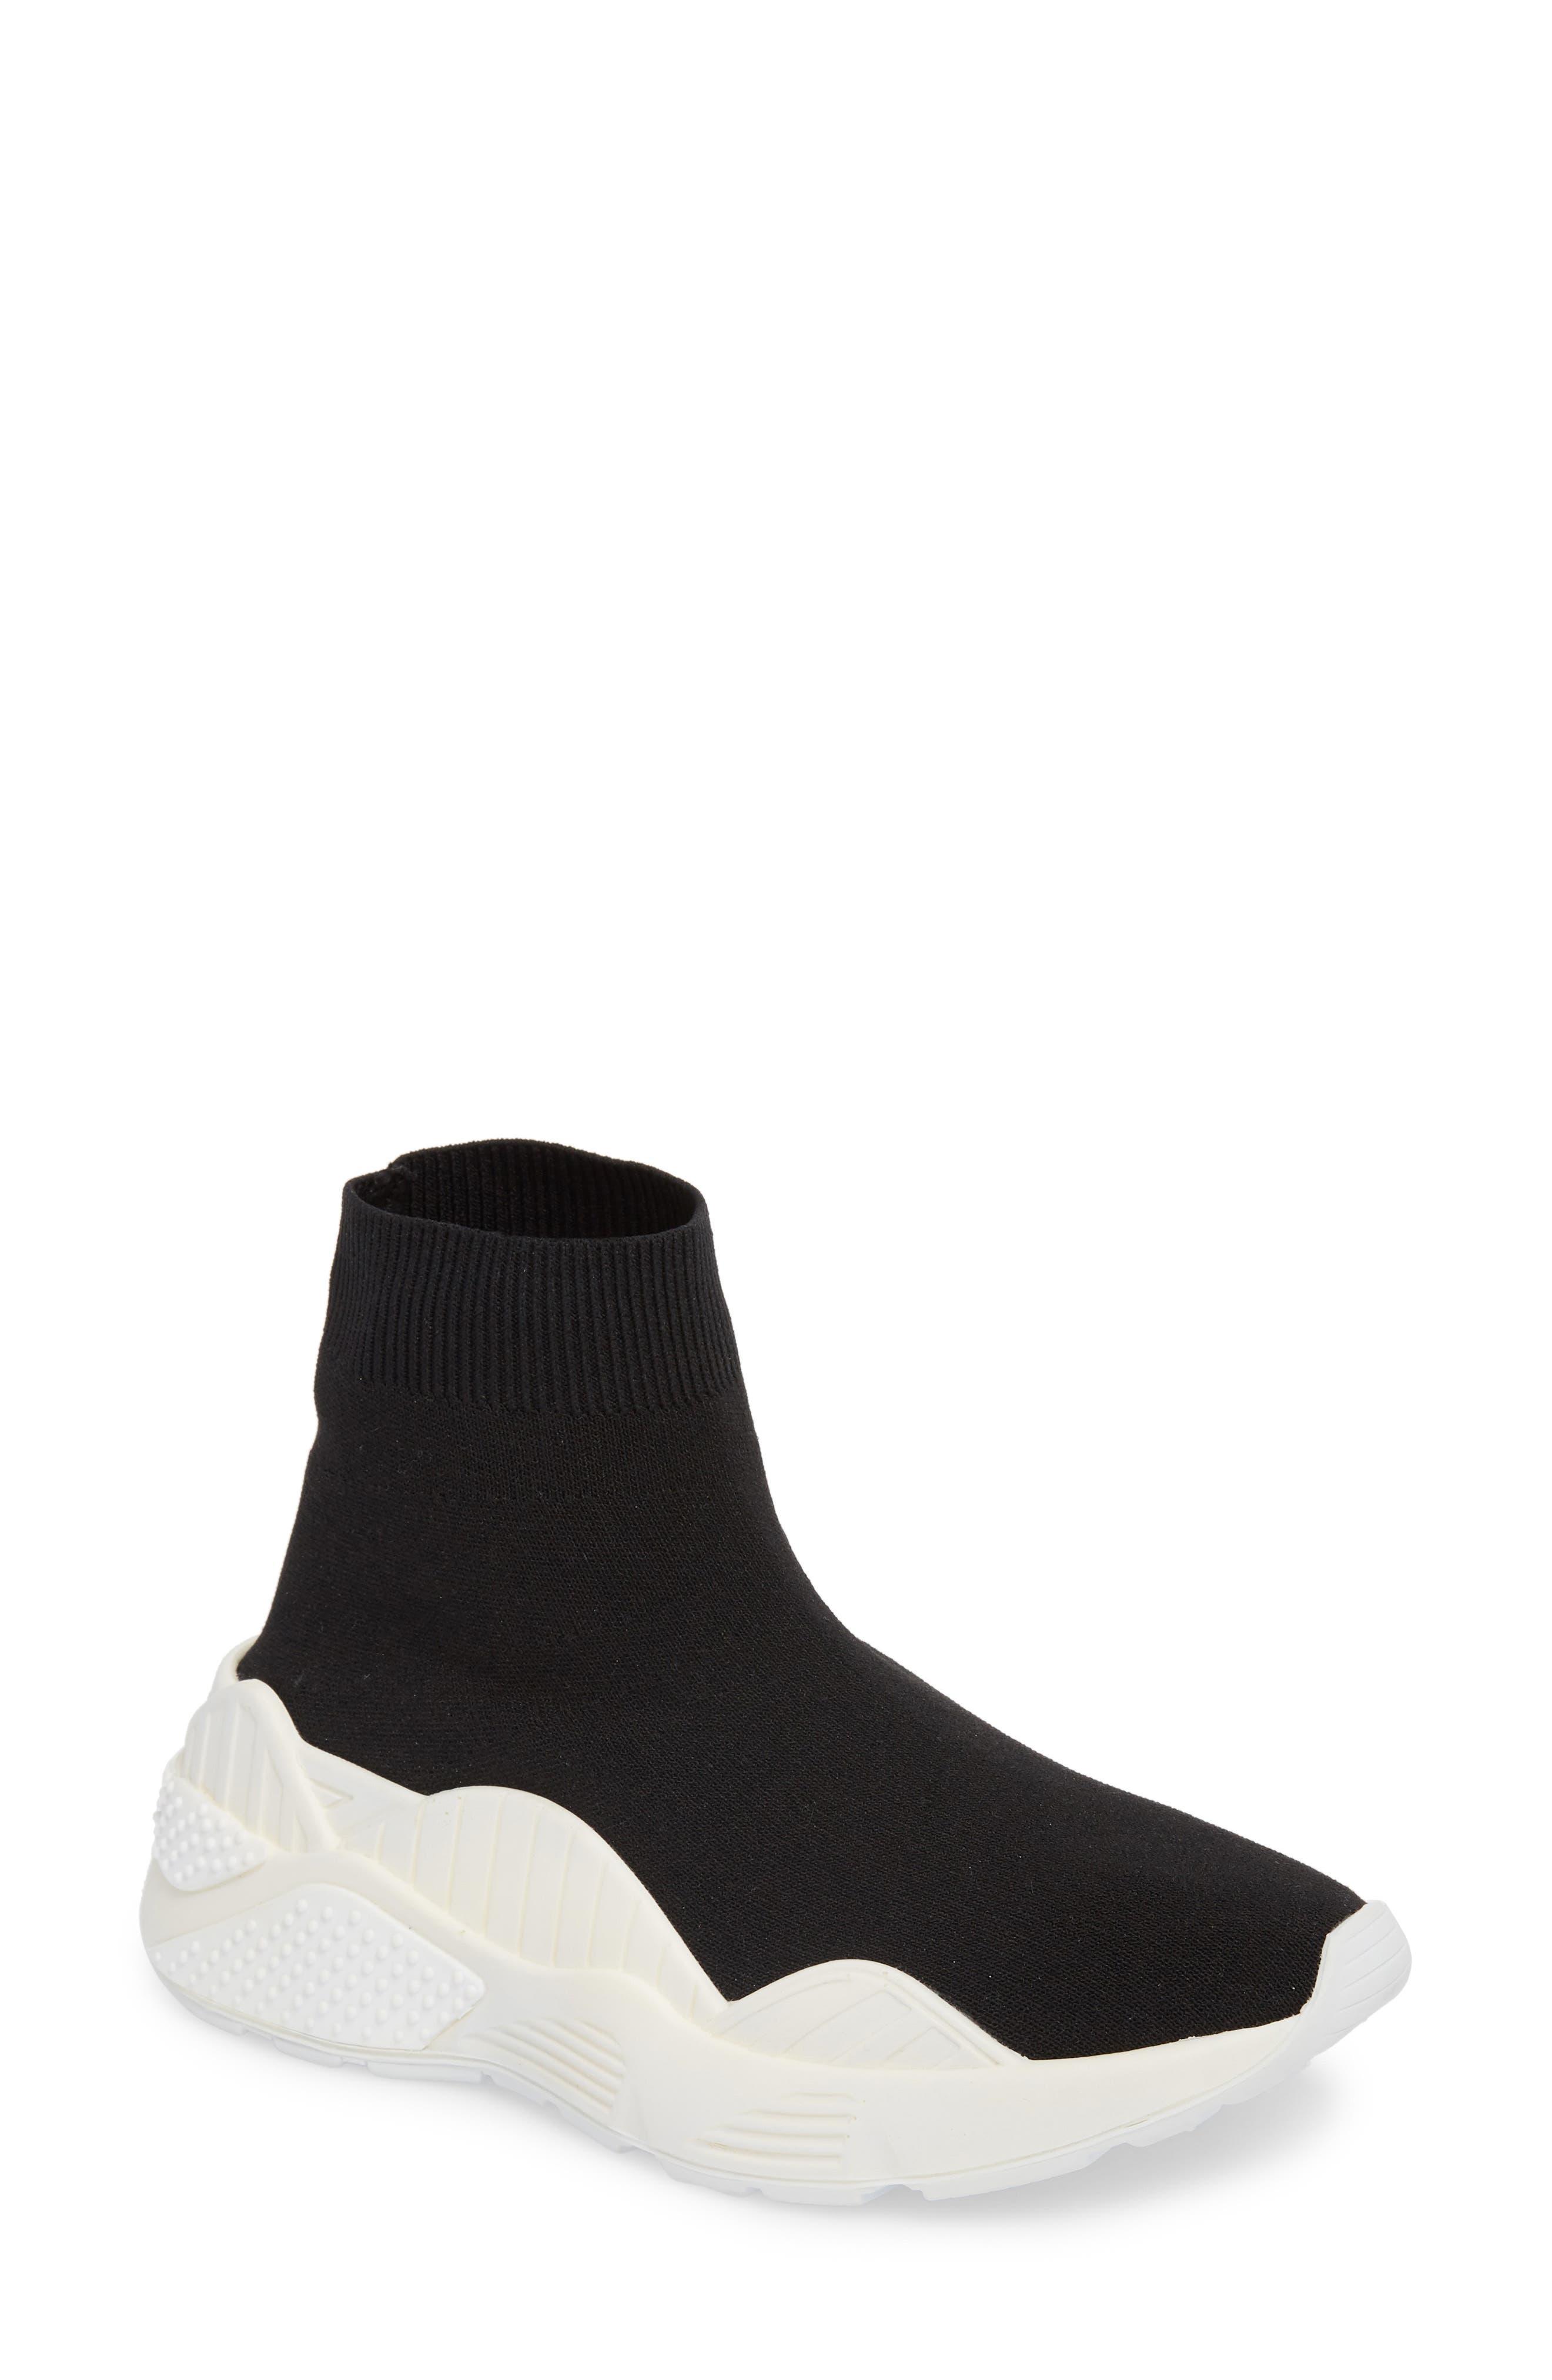 Lunix Sock Sneaker,                             Main thumbnail 1, color,                             014